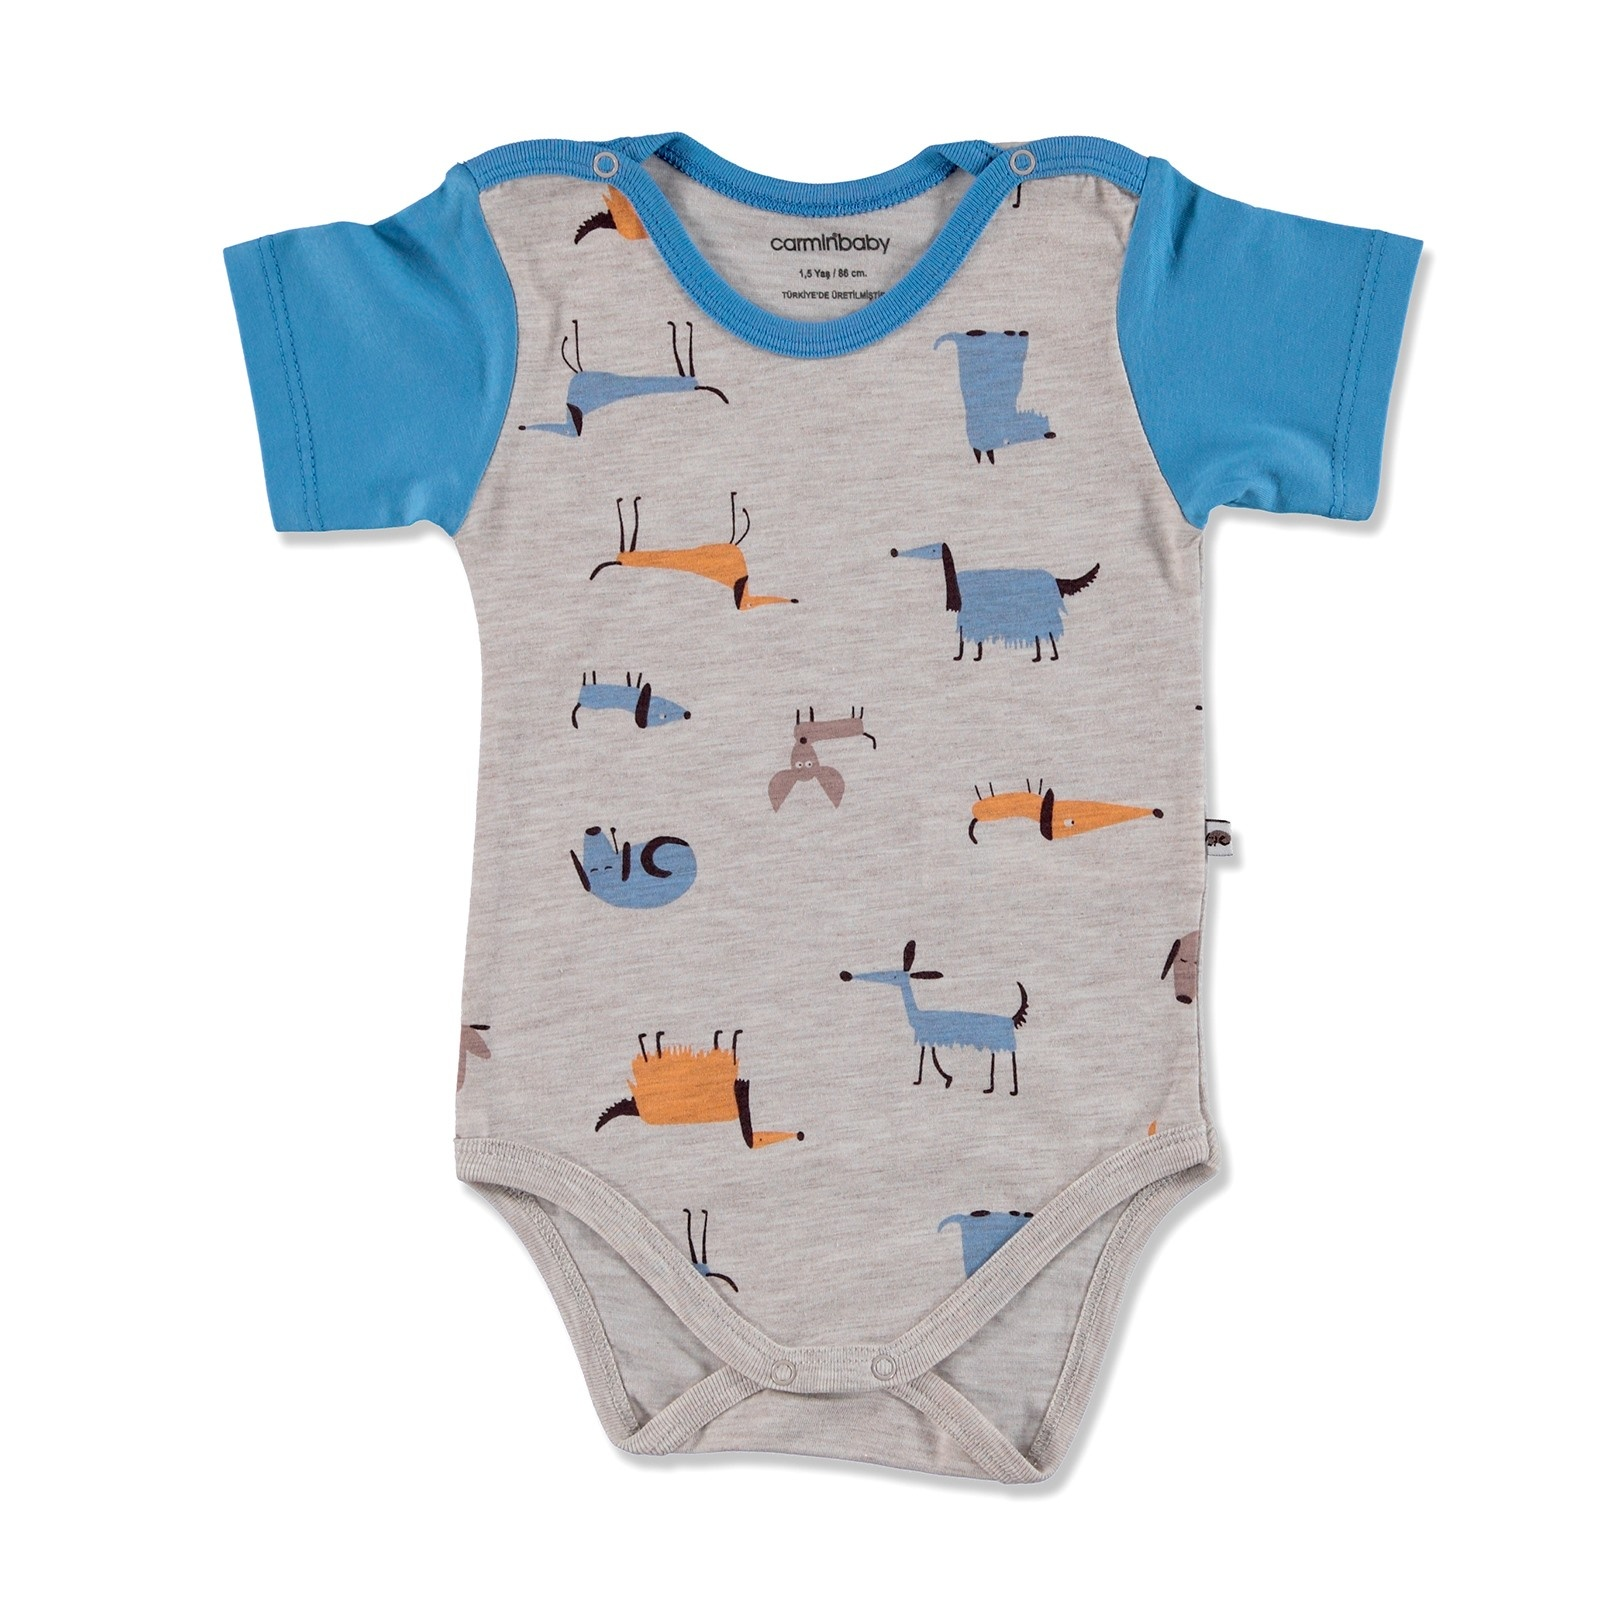 Ebebek Carmin Baby Summer Boy Dog Printed Supreme Short Sleeve Bodysuit